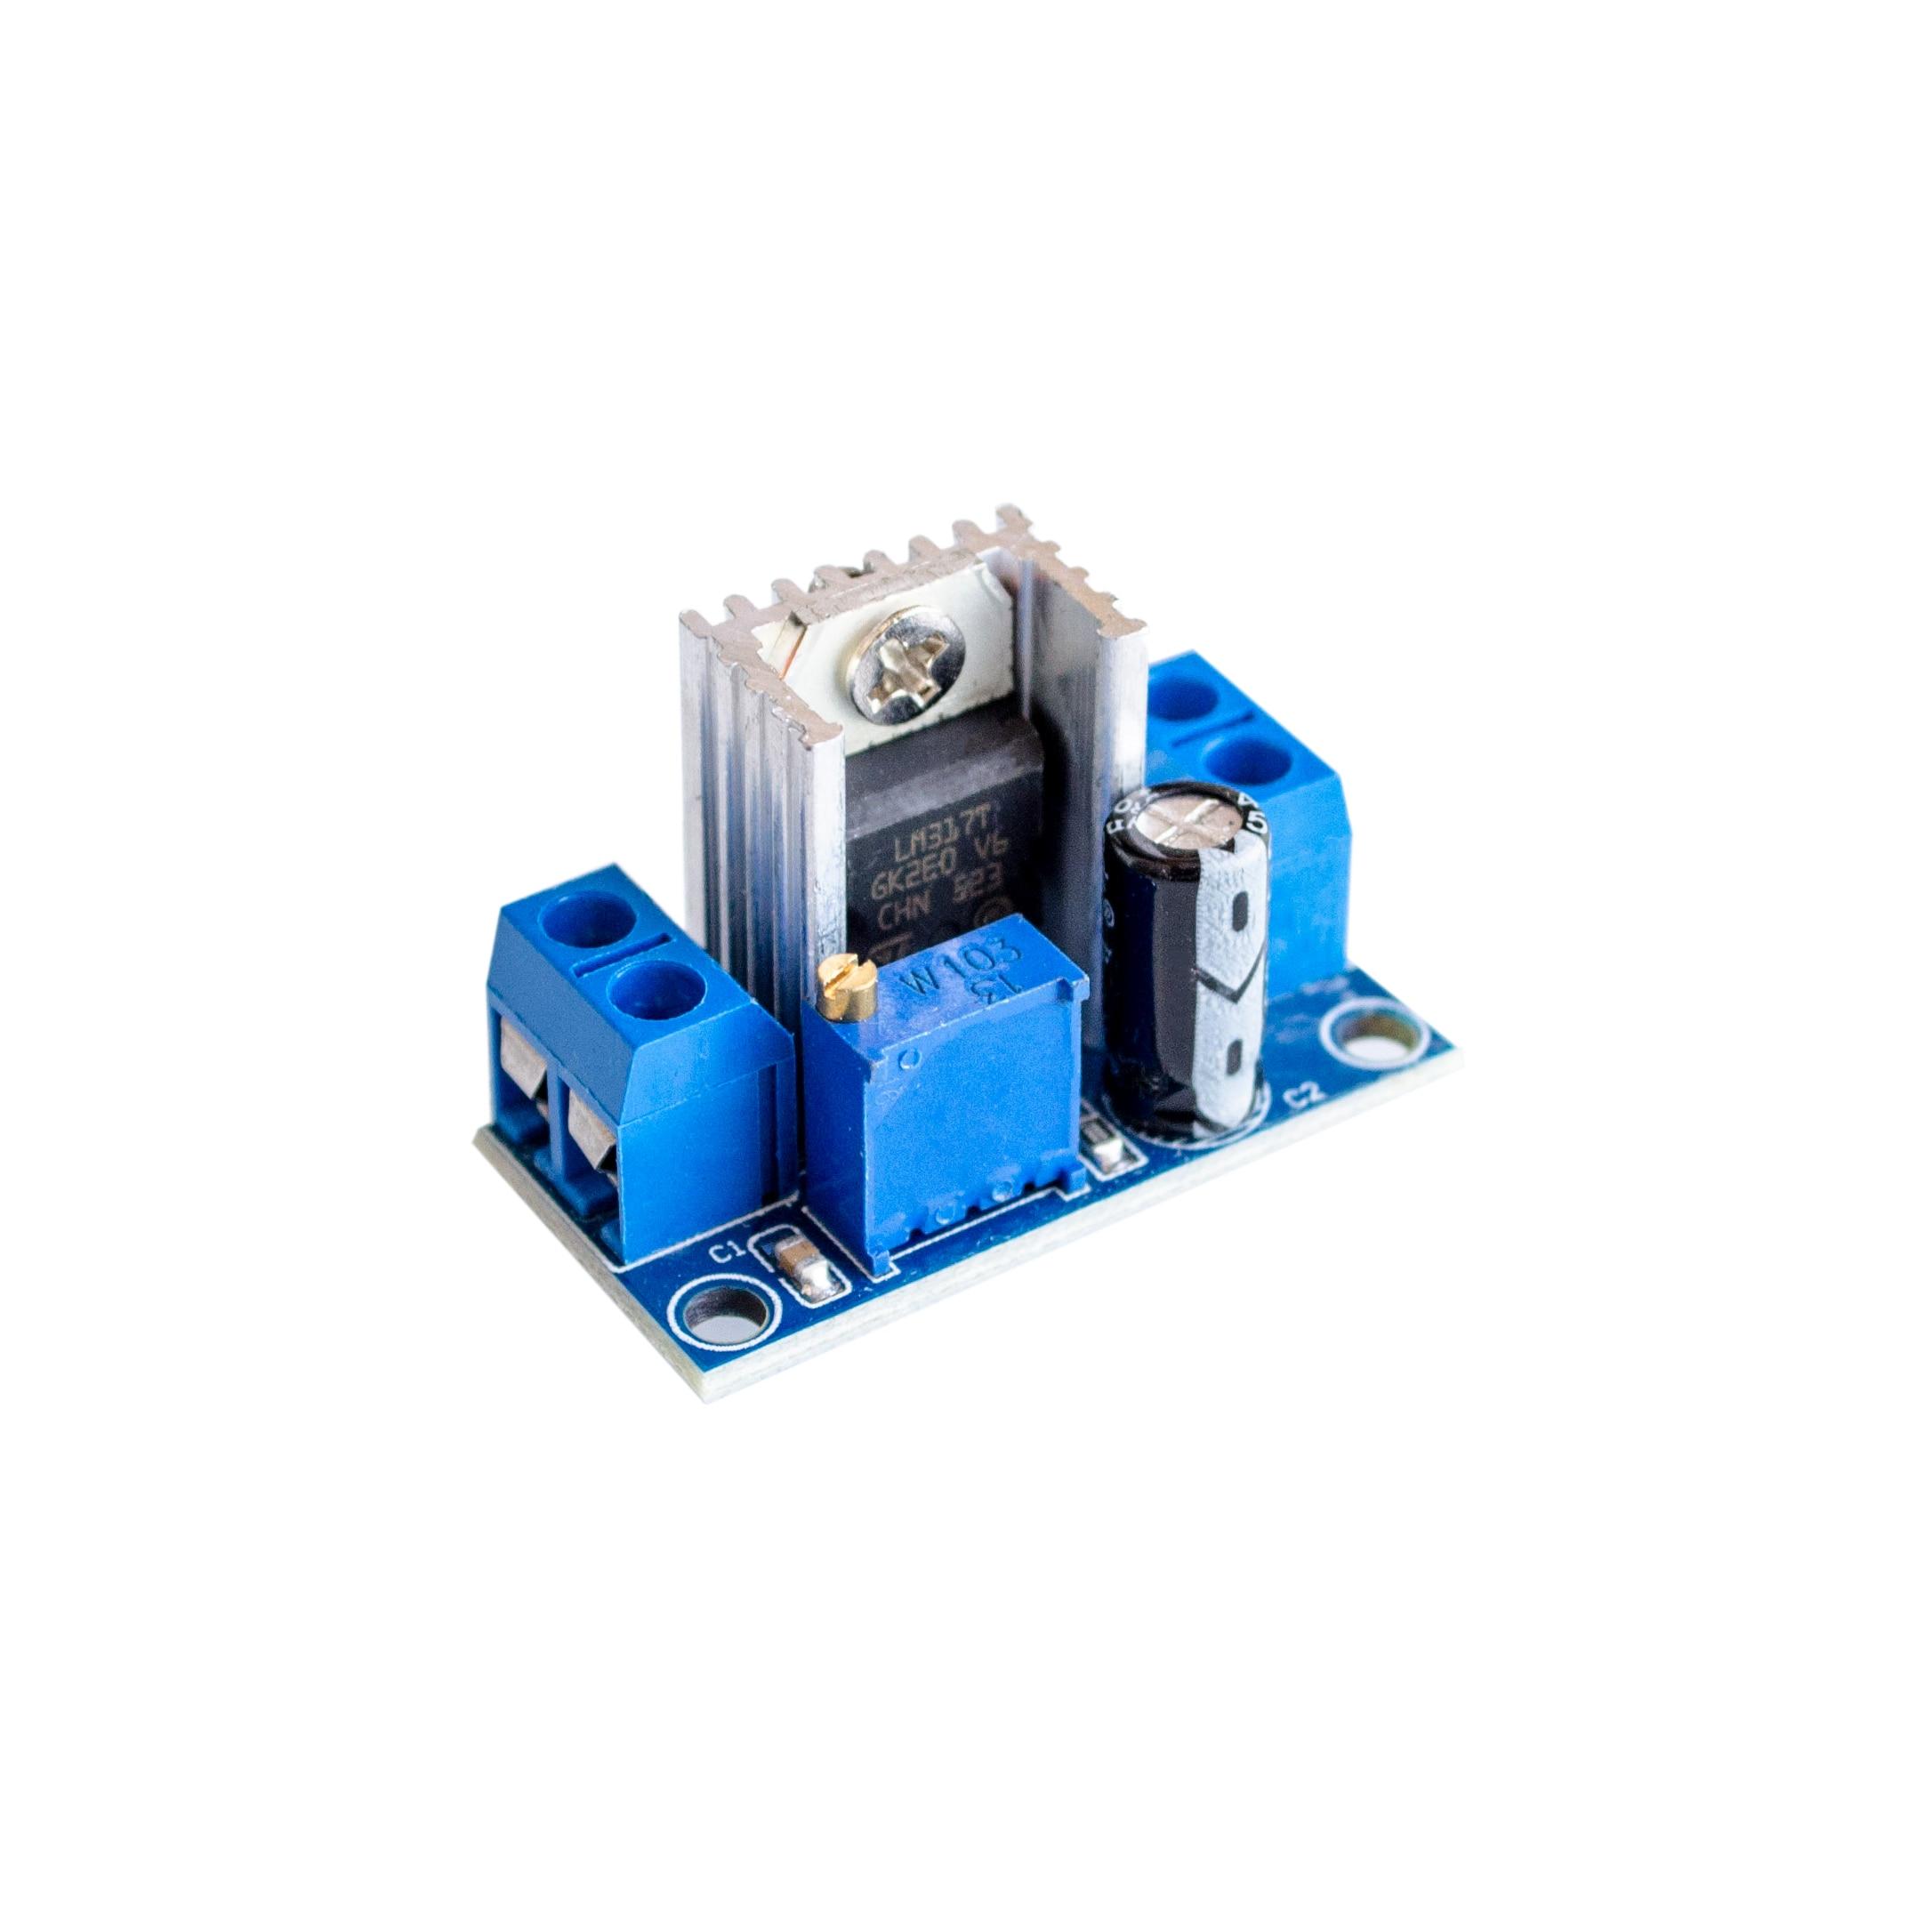 Lm317 Dc Converter Buck Step Down Circuit Board Module Linear Voltage Regulator Calculator Electronic Circuits Schematics Adjustable